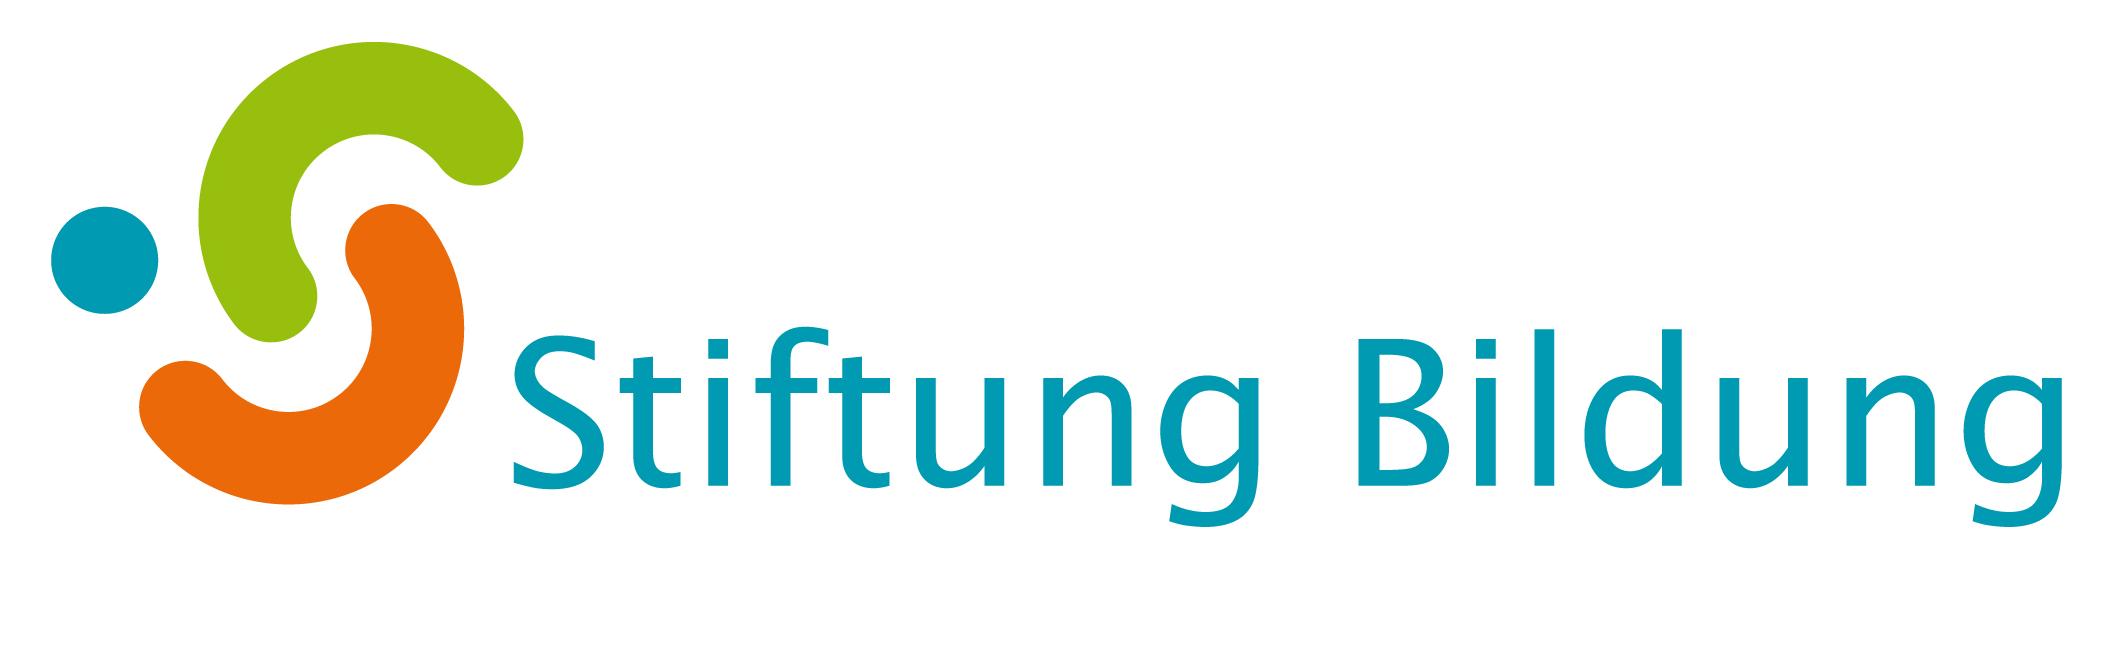 Logo-Stiftung-Bildung.png